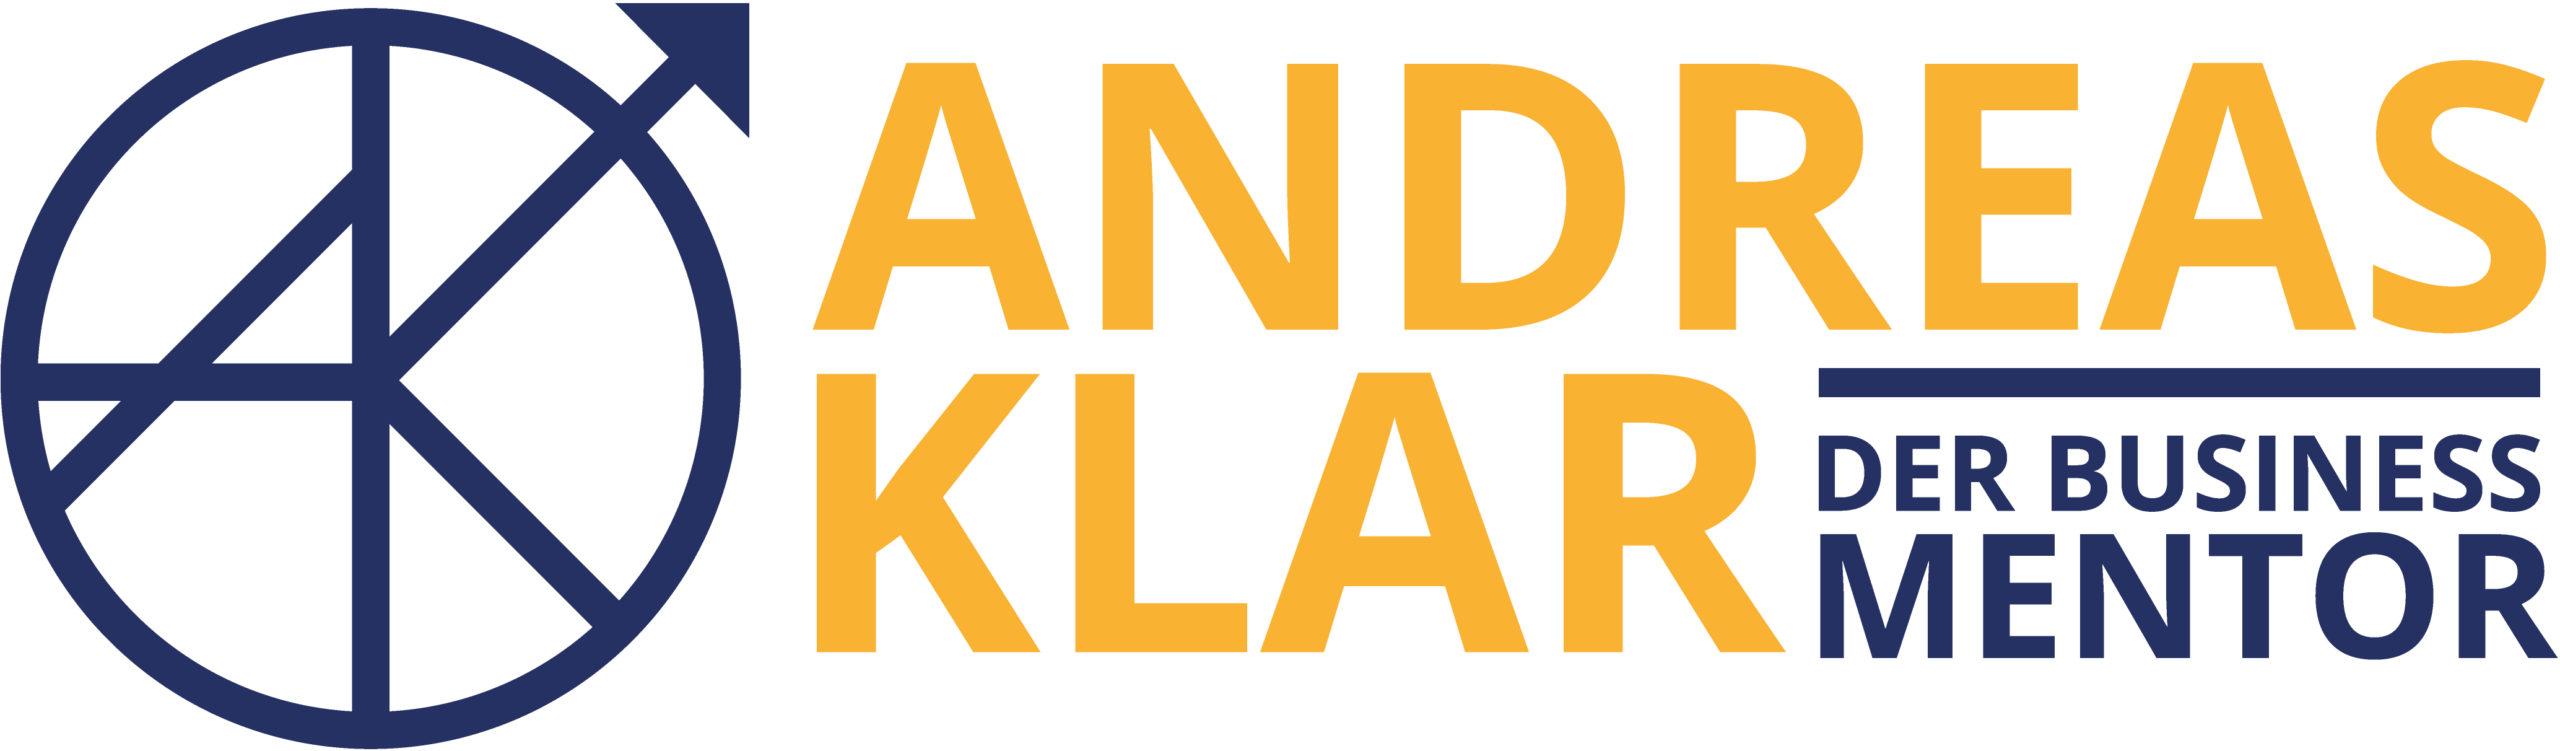 Andreas Klar